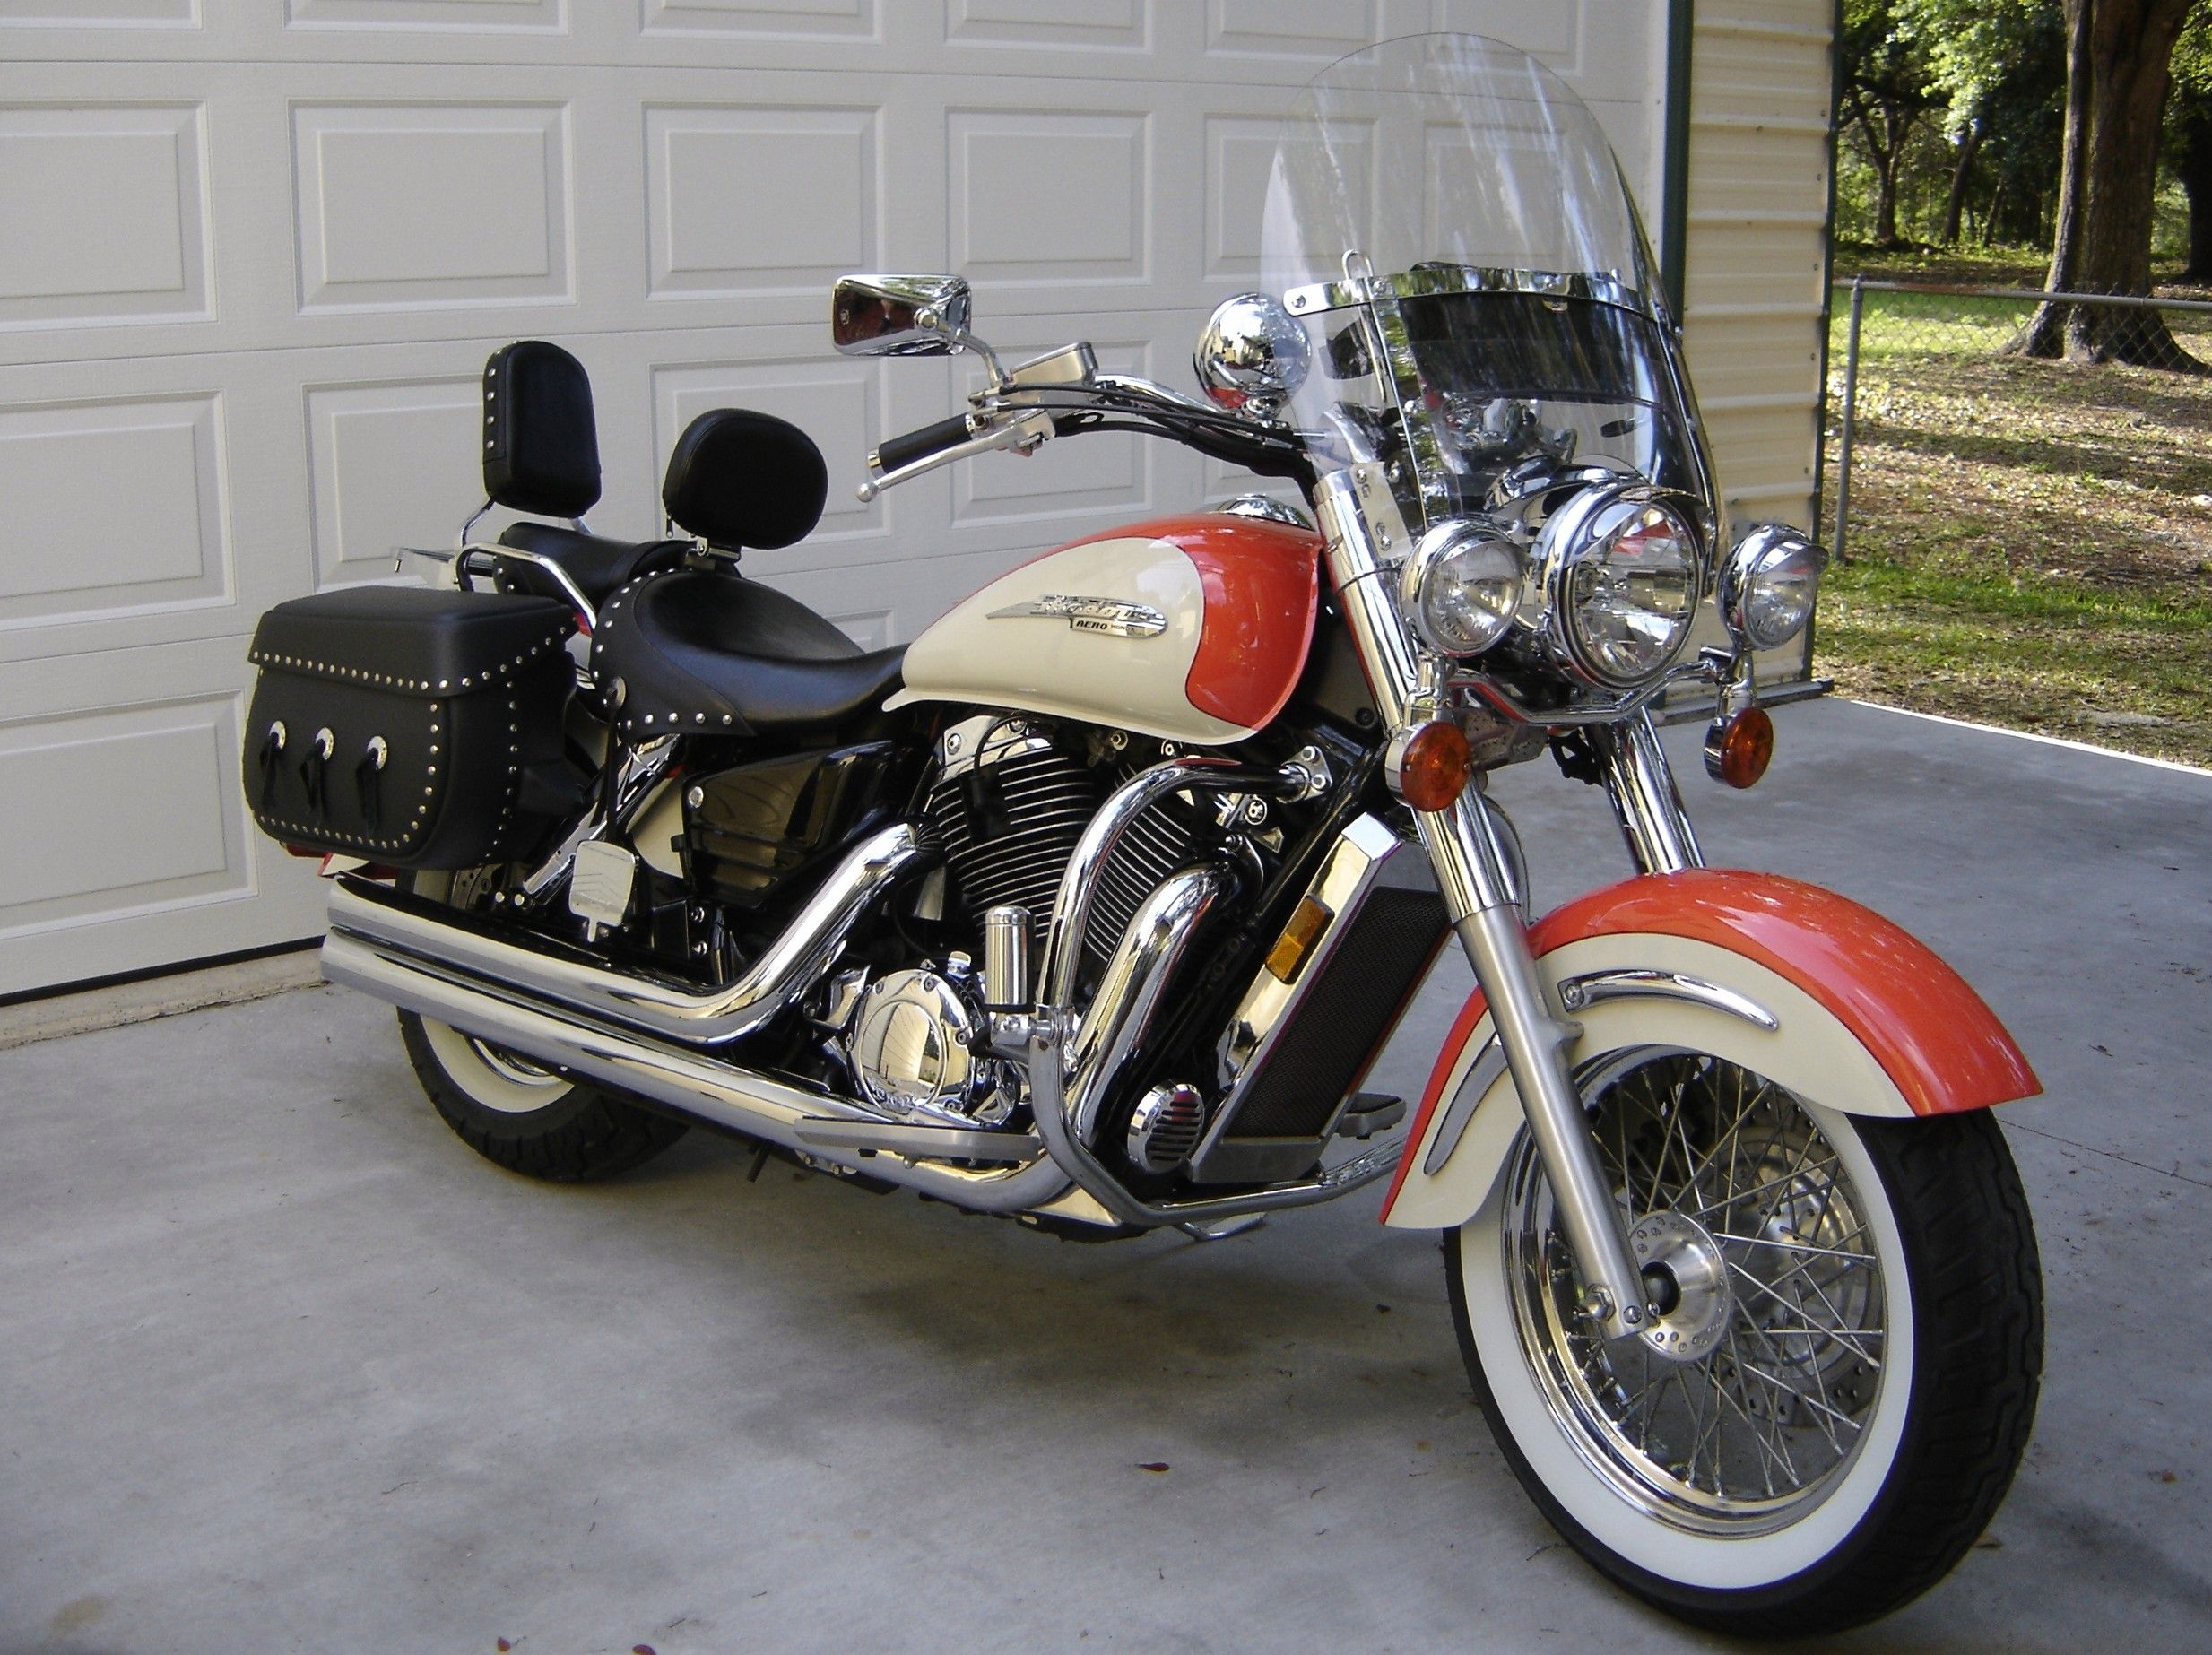 hight resolution of my ride 1999 honda shadow aero 1100